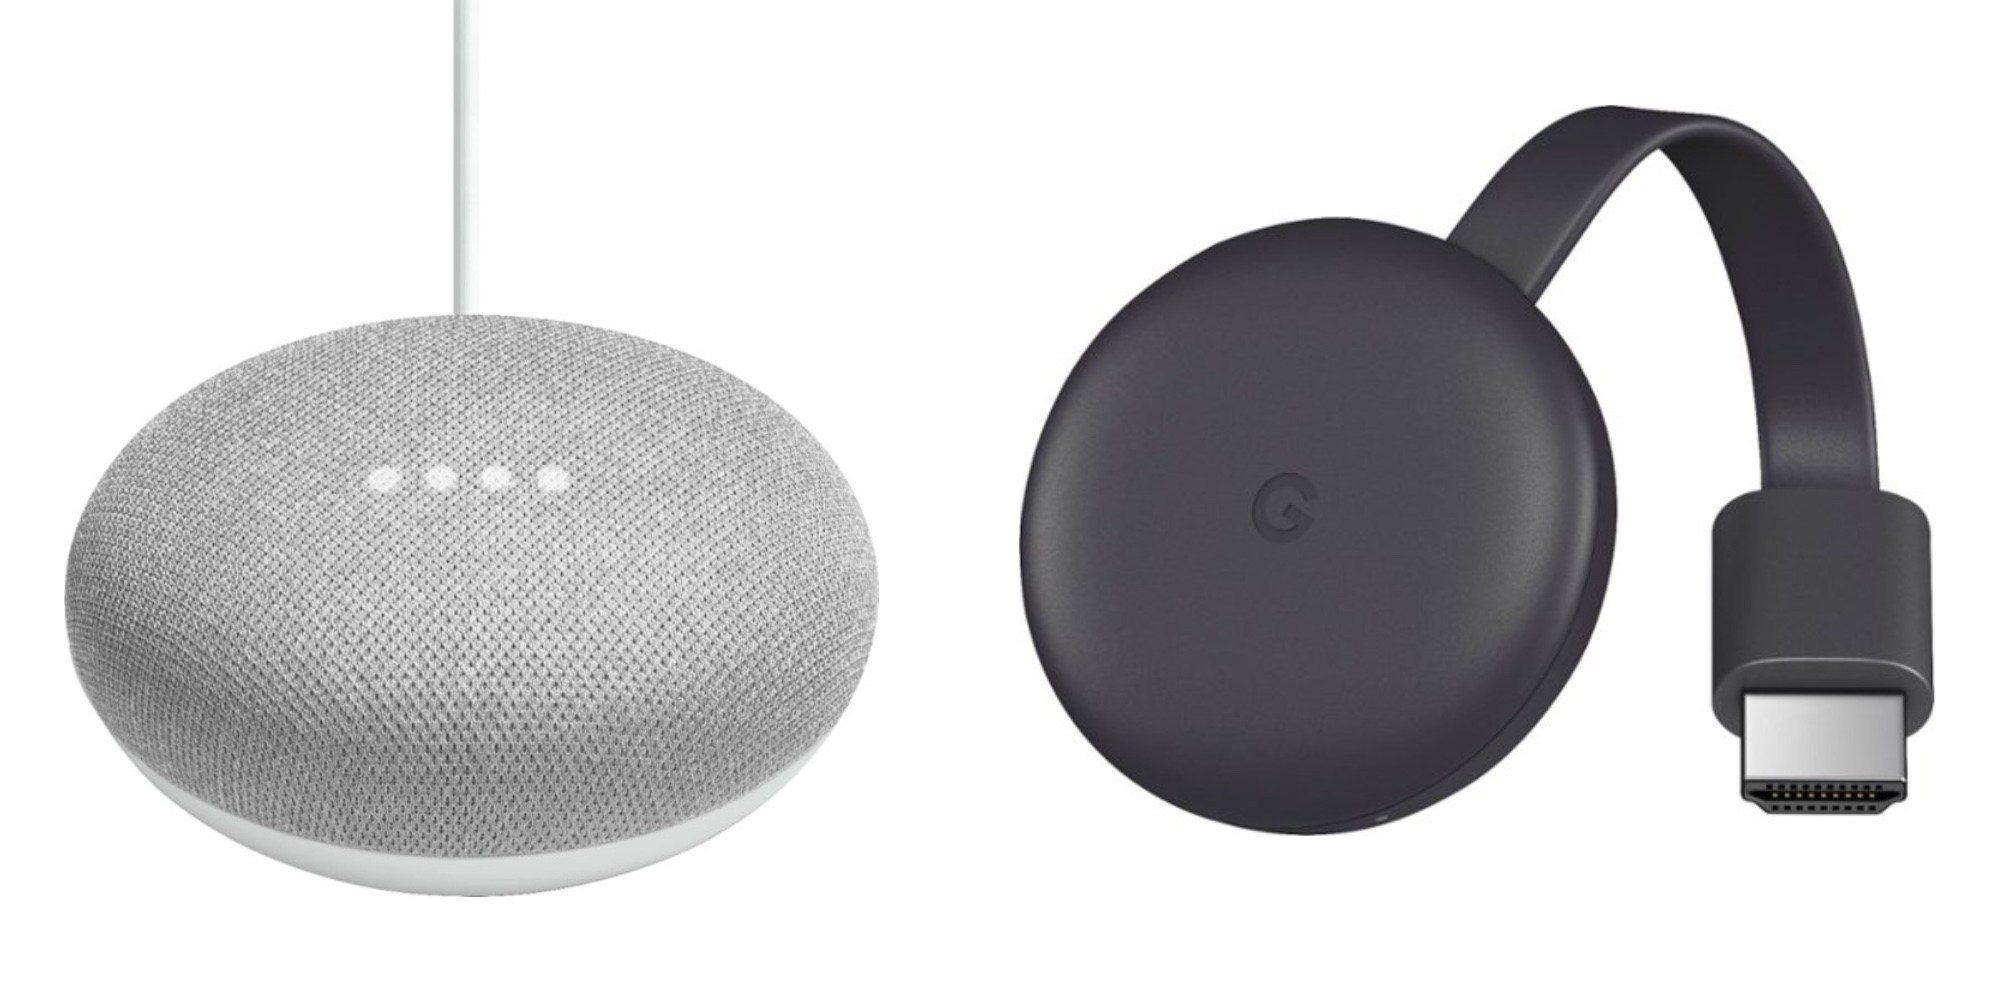 Chromecast and Google Home Mini bundled at $44, plus deals on Chromebooks, more